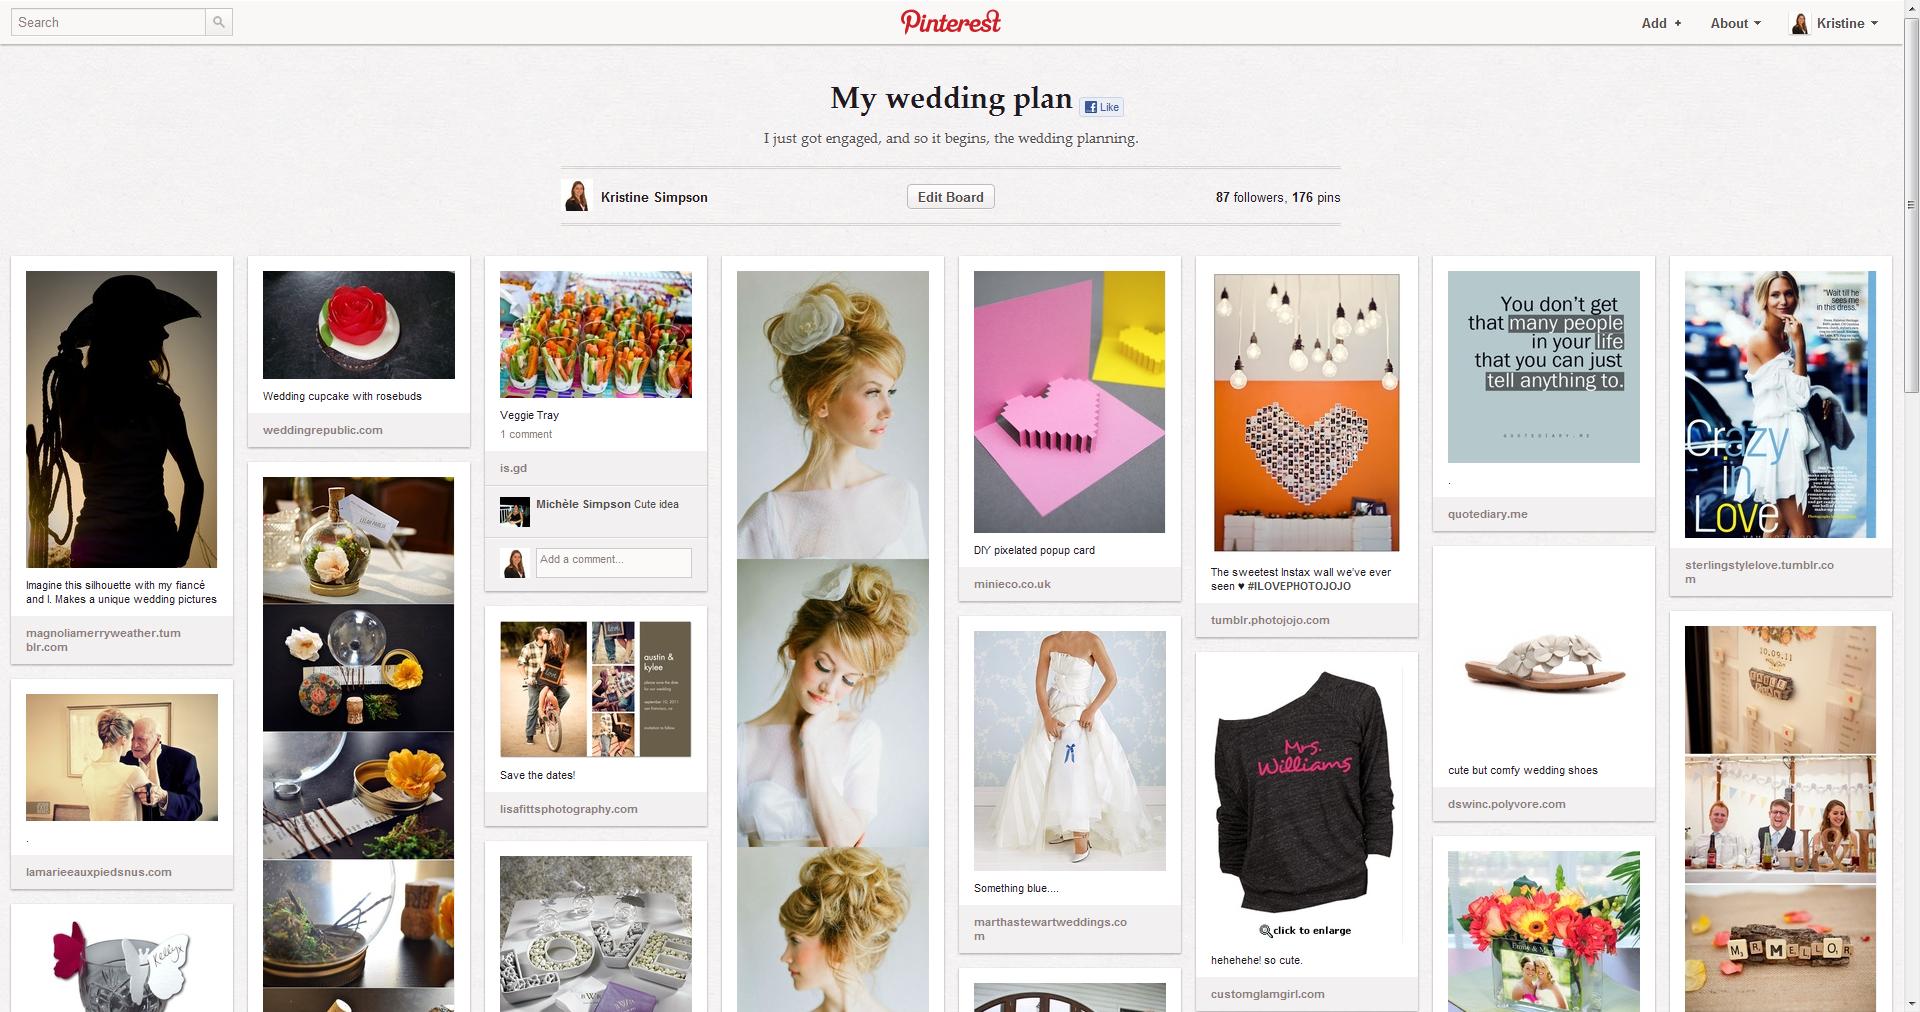 Wedding Craft Ideas Pinterest : Wedding Craft Ideas Pinterest Party Invitations Ideas